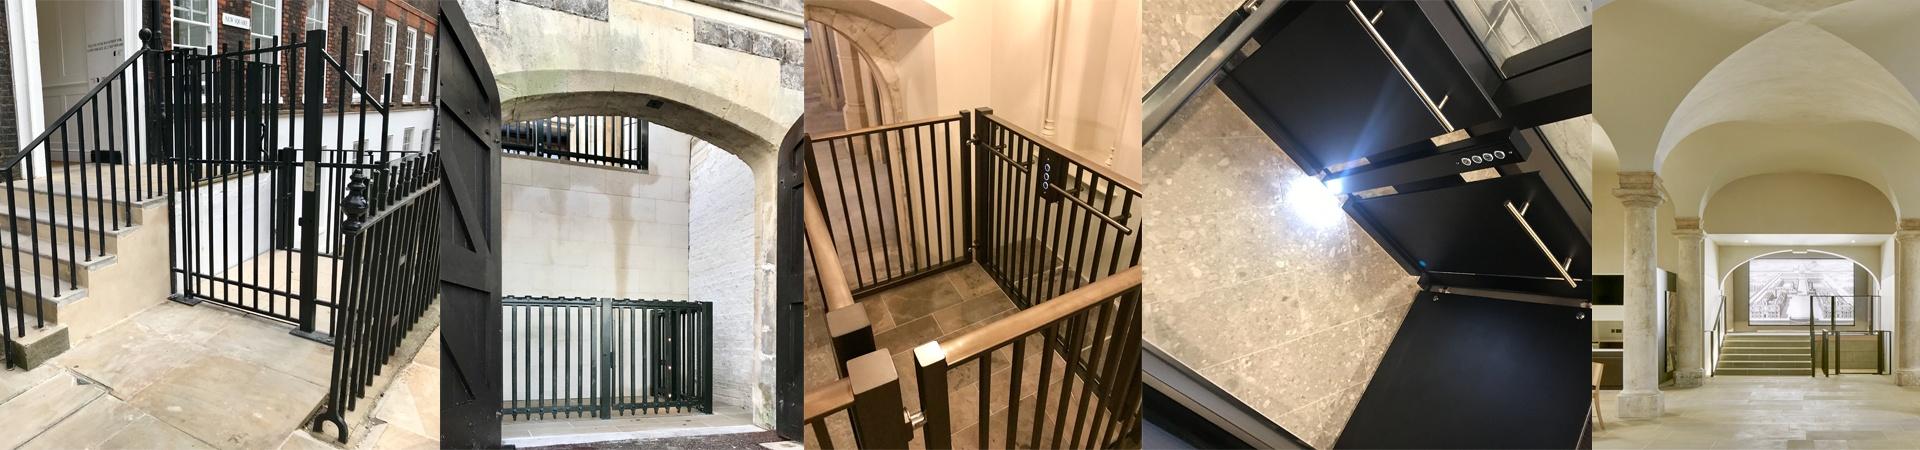 Custom Disabled access lift